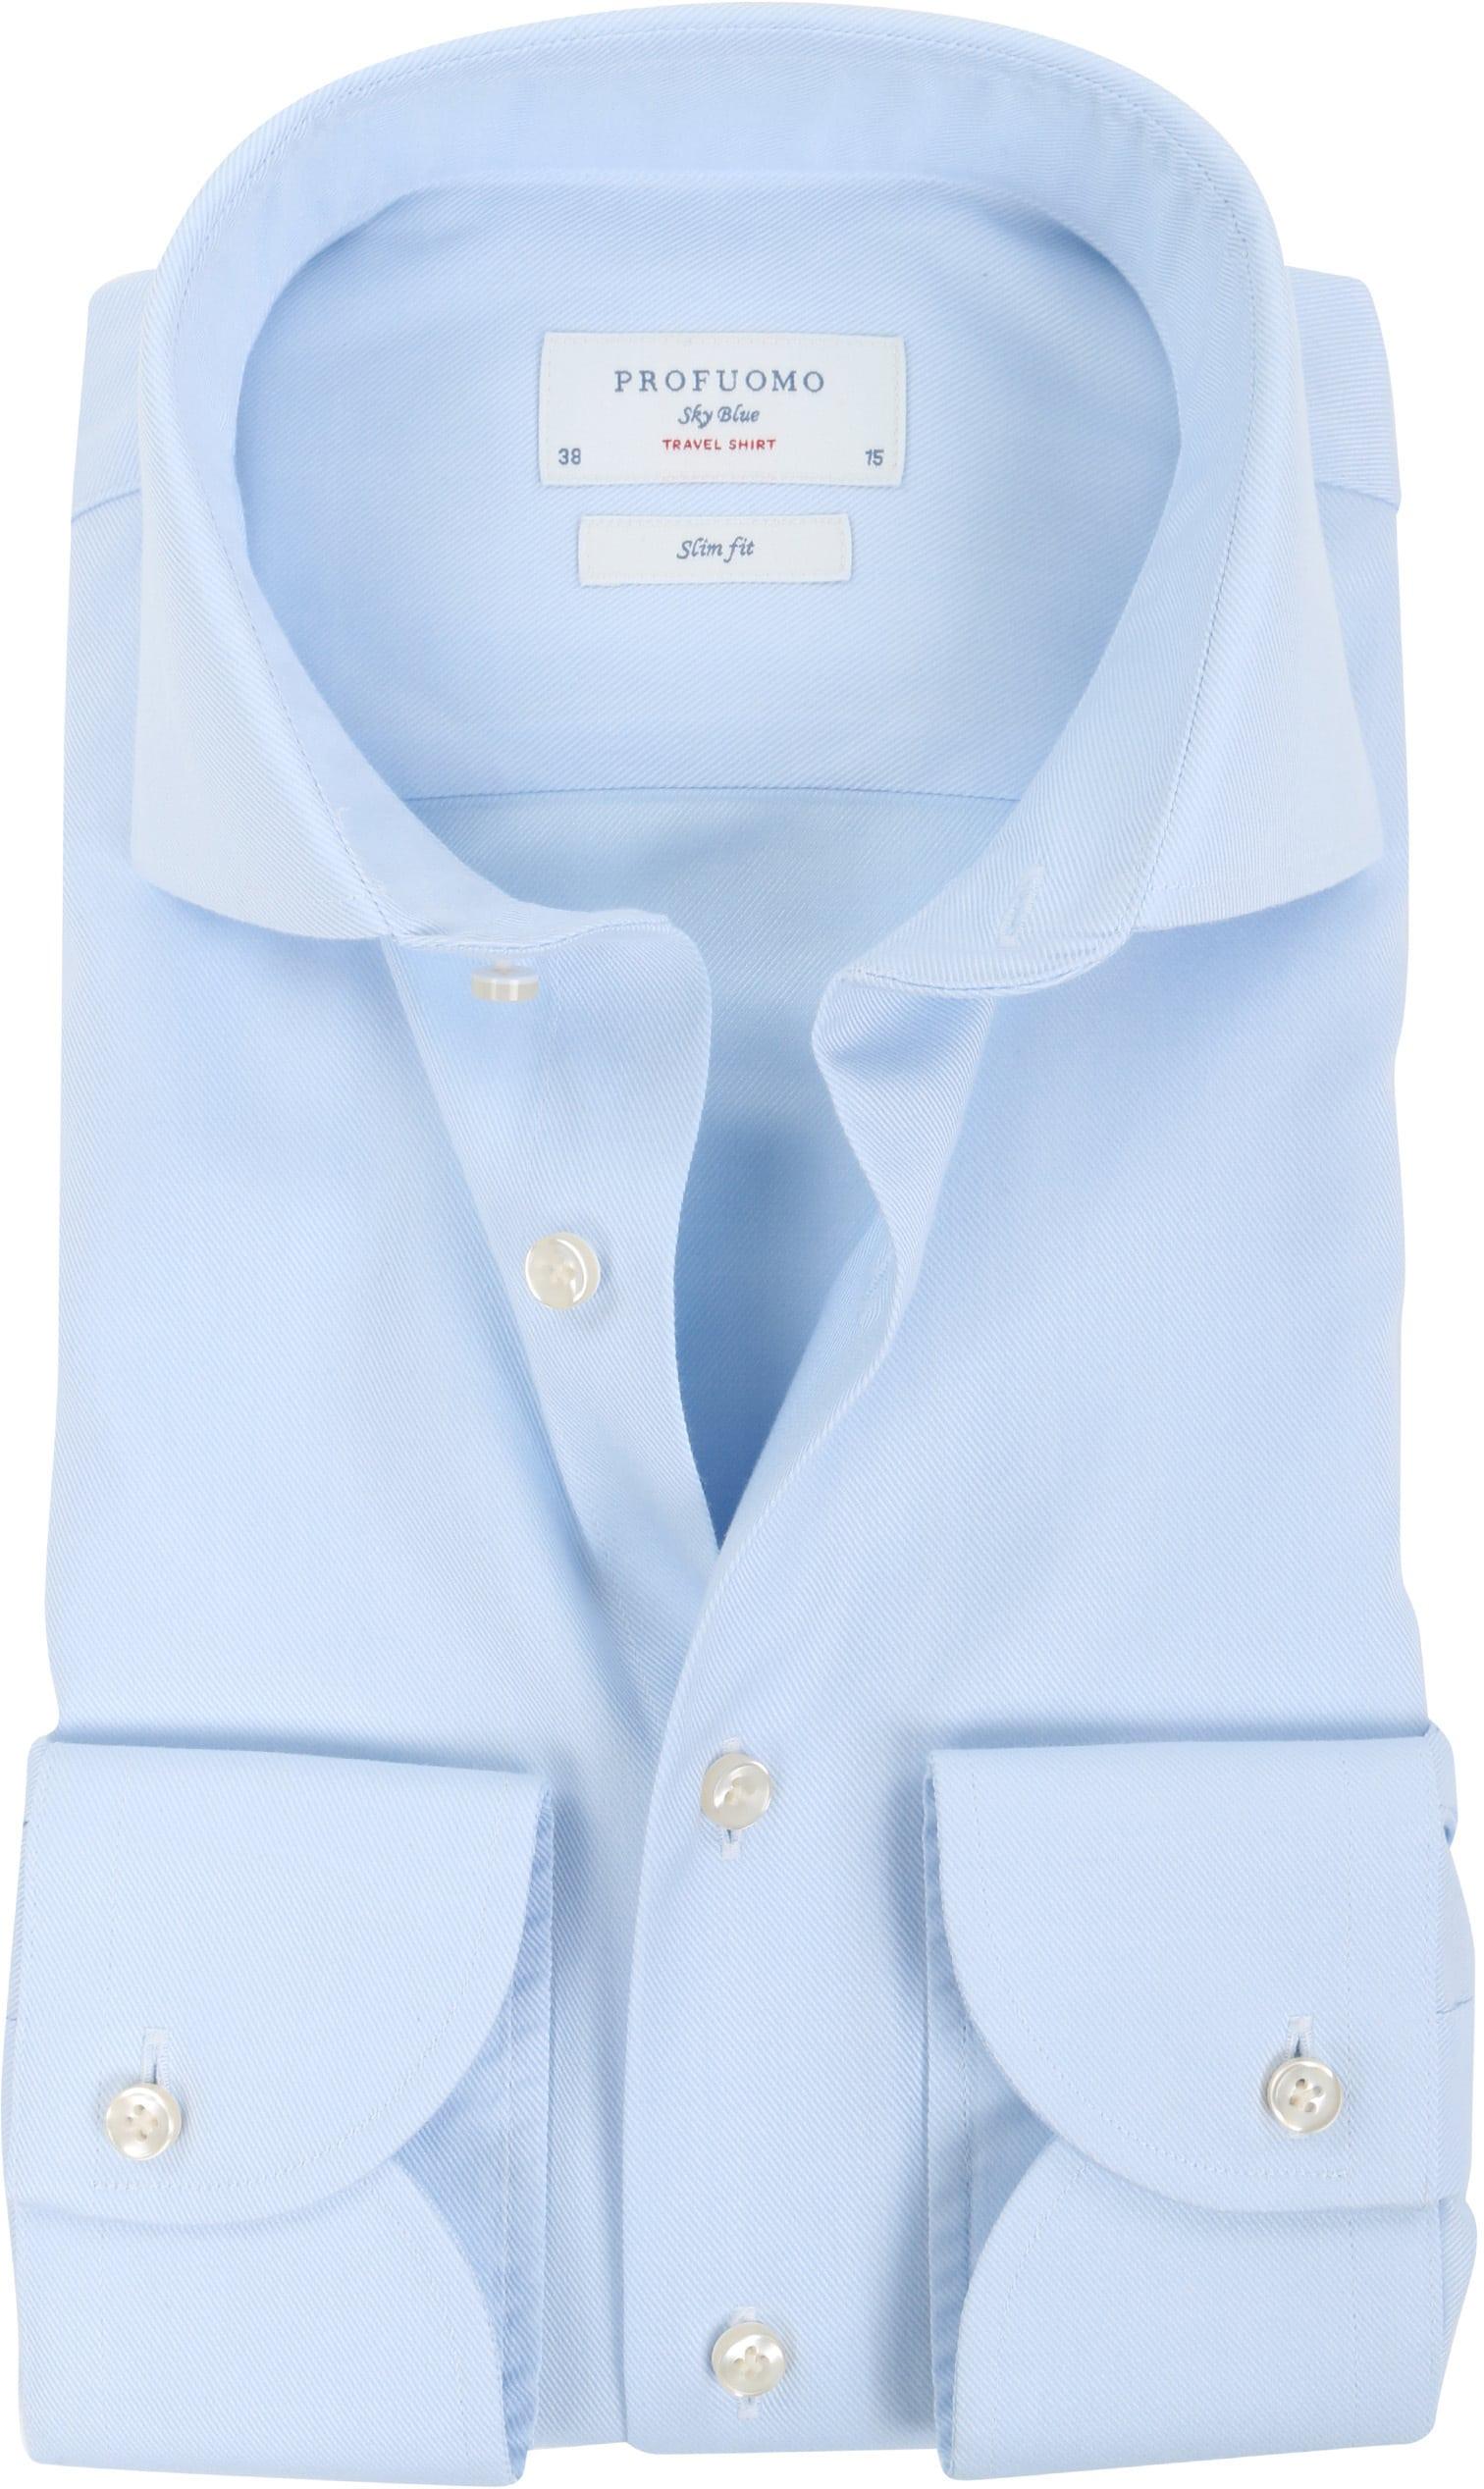 Profuomo Sky Blue Travel Shirt Blau foto 0